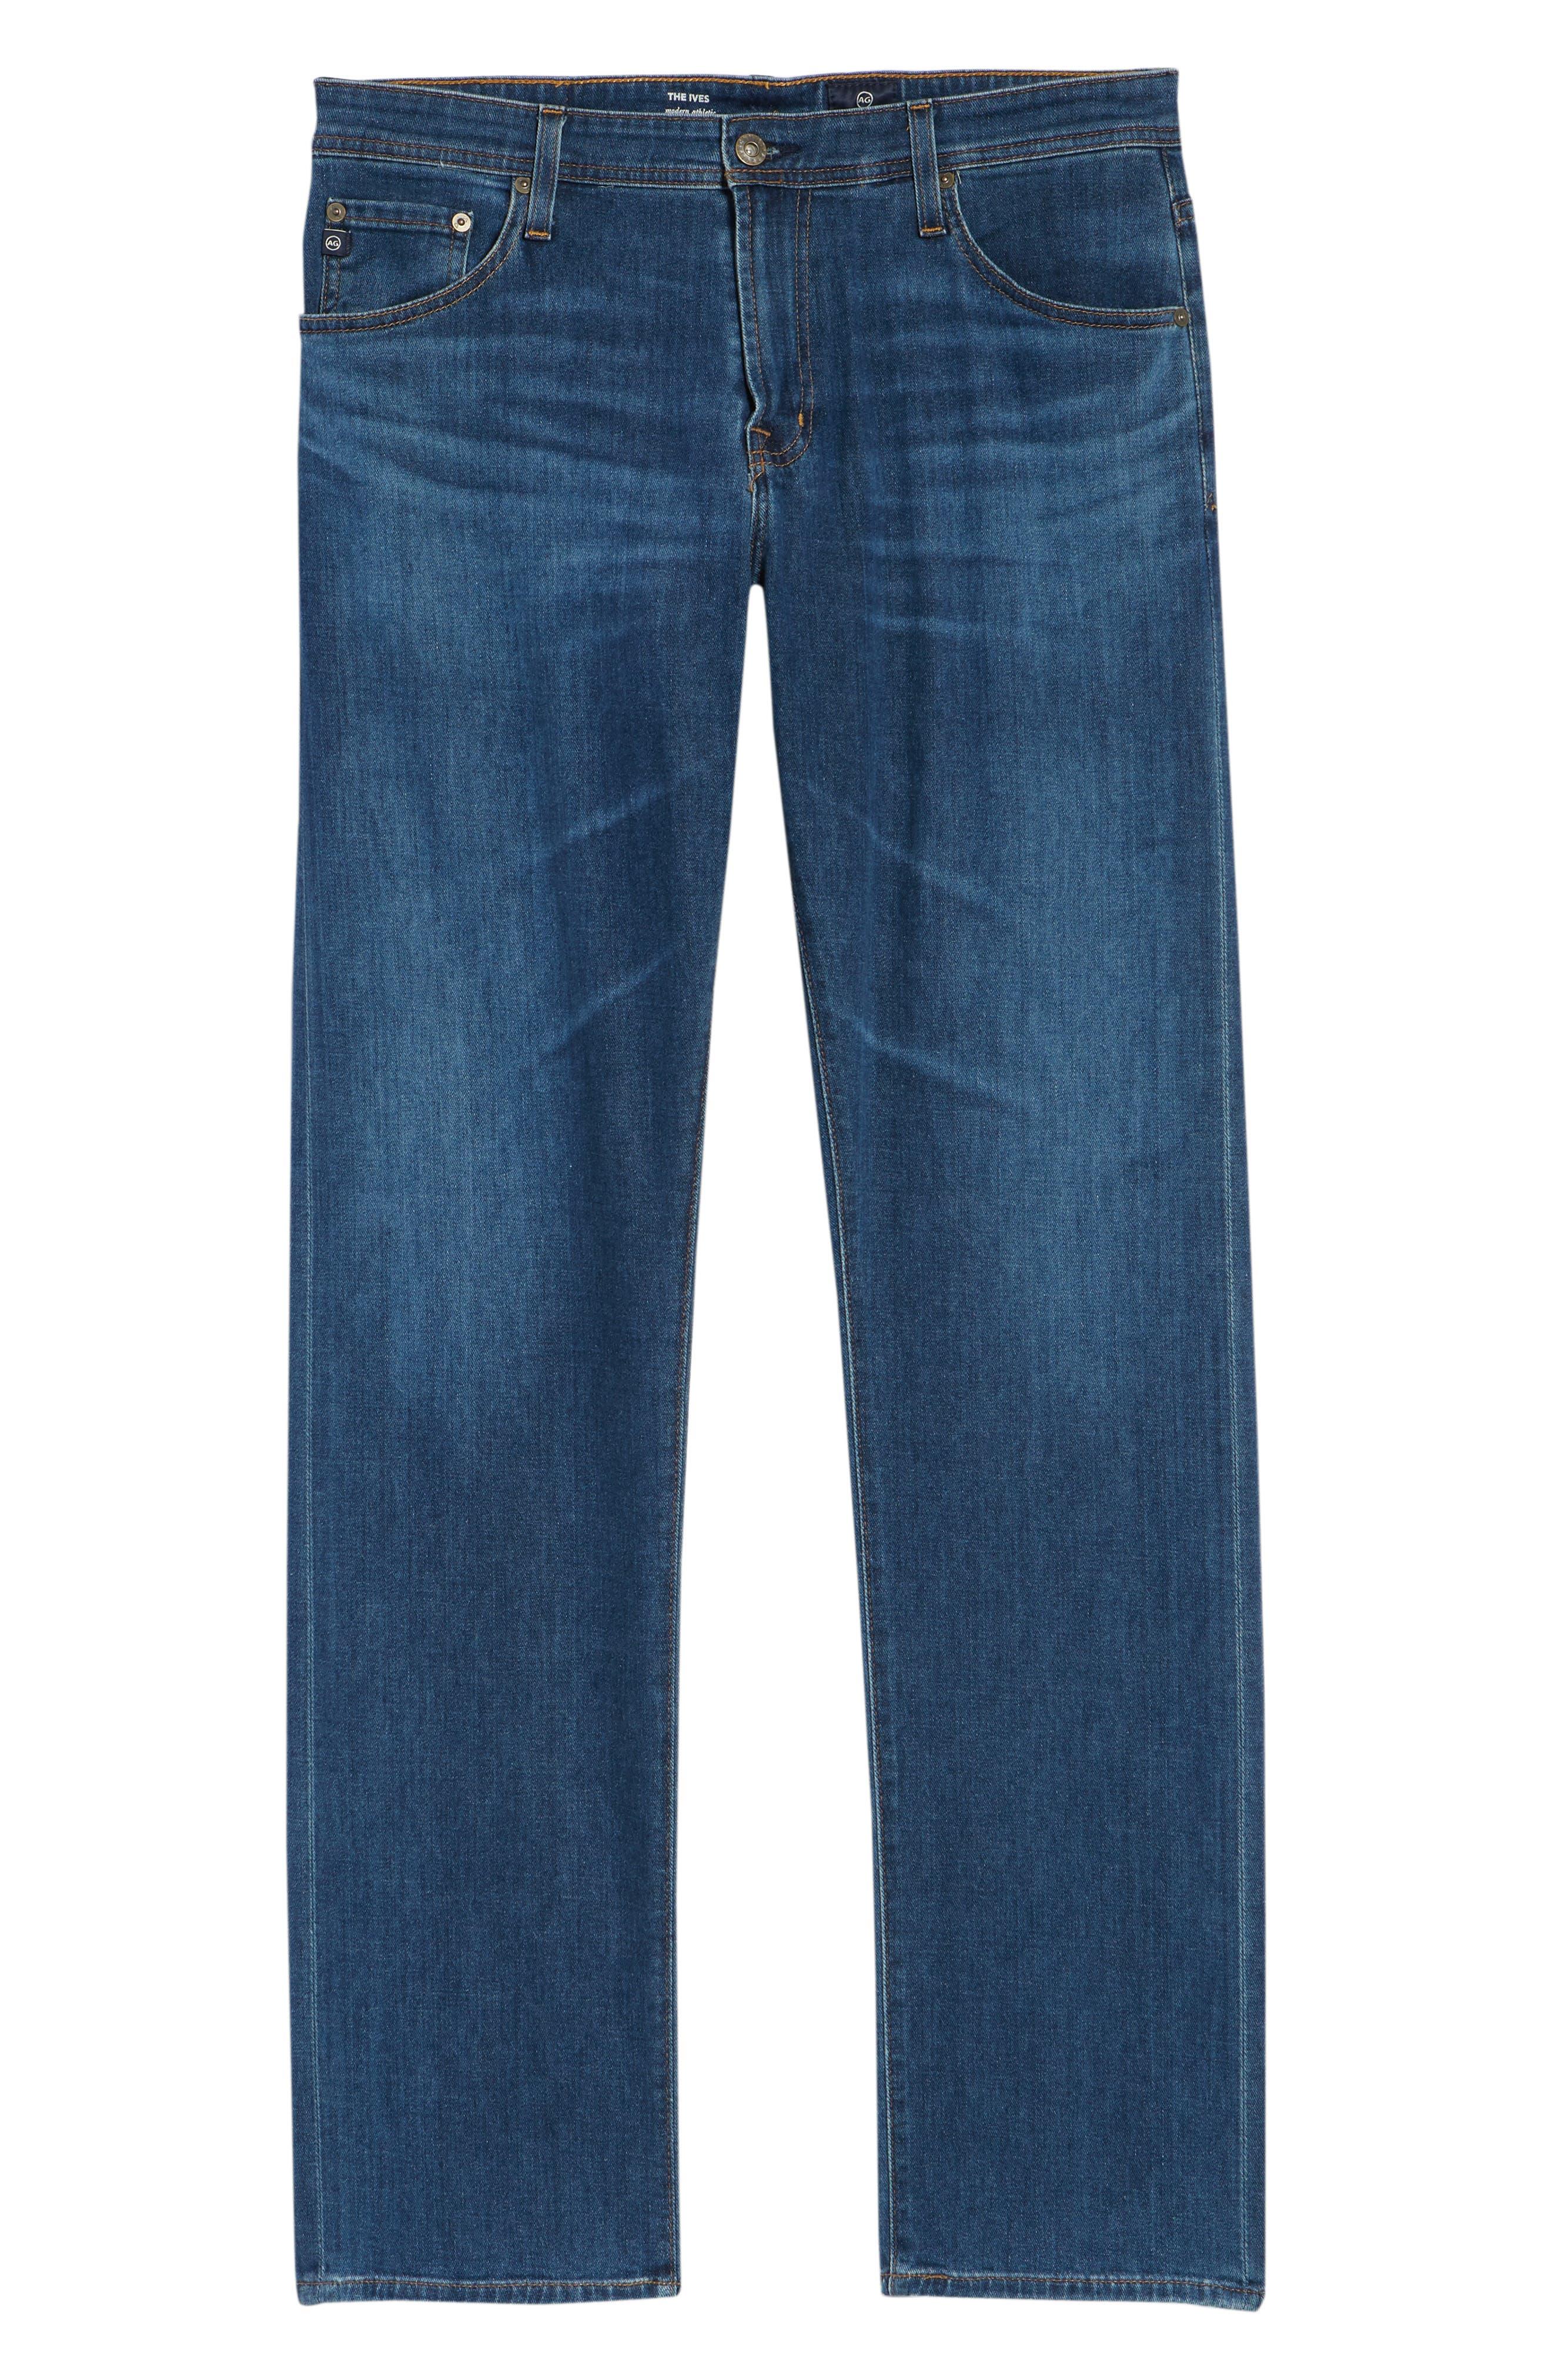 Ives Straight Leg Jeans,                             Alternate thumbnail 6, color,                             EDITION